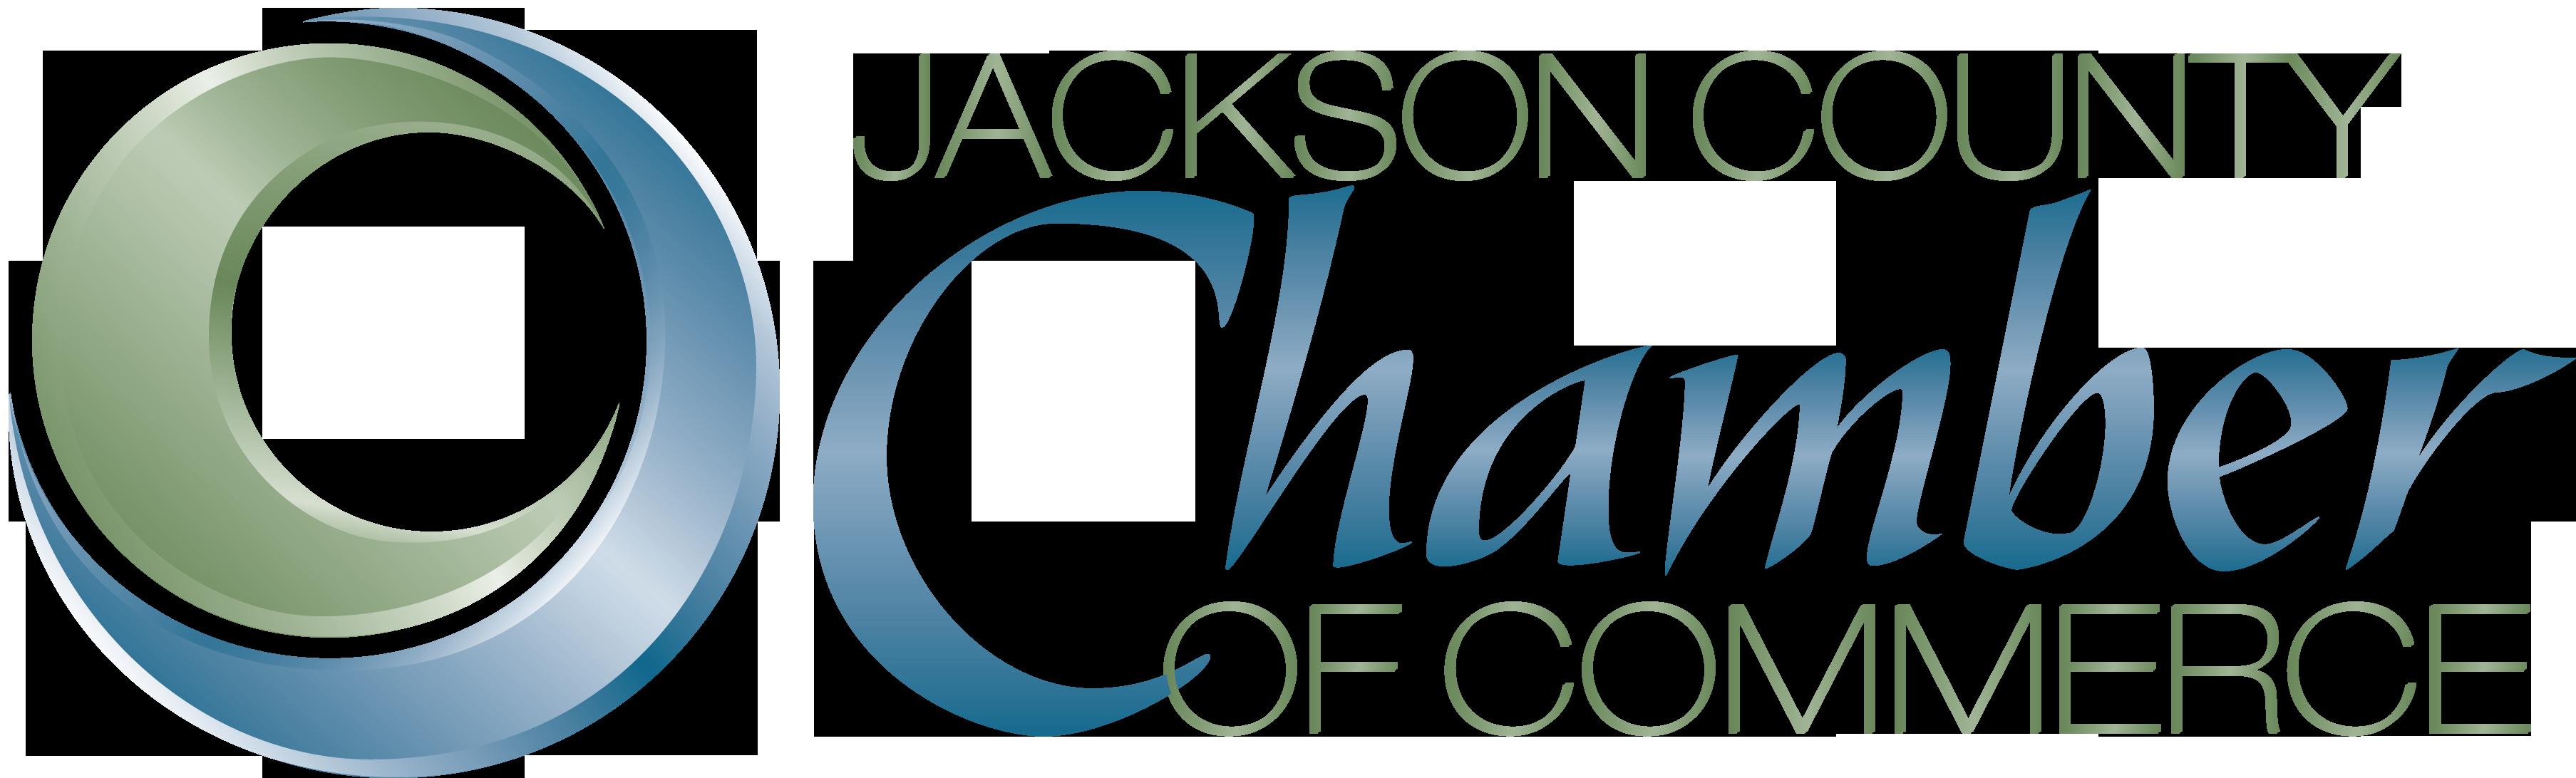 jackson county chamber logo color2010.png